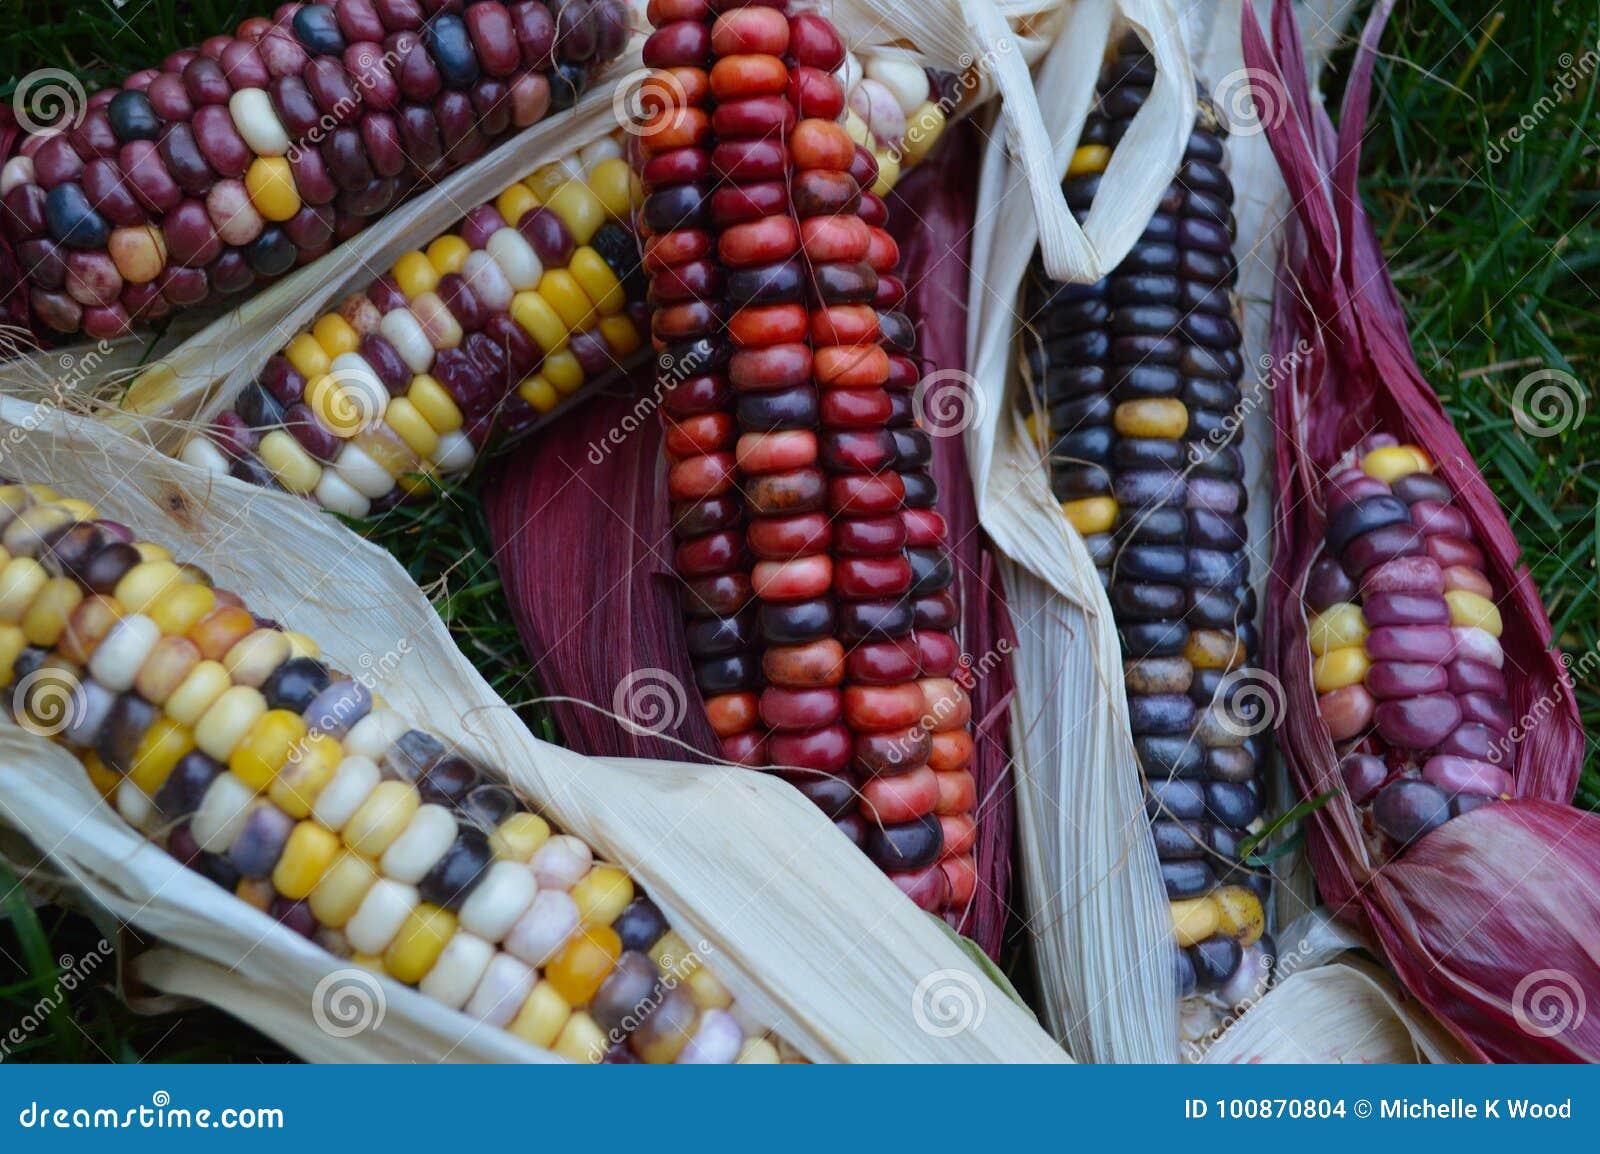 Indian corn on grass